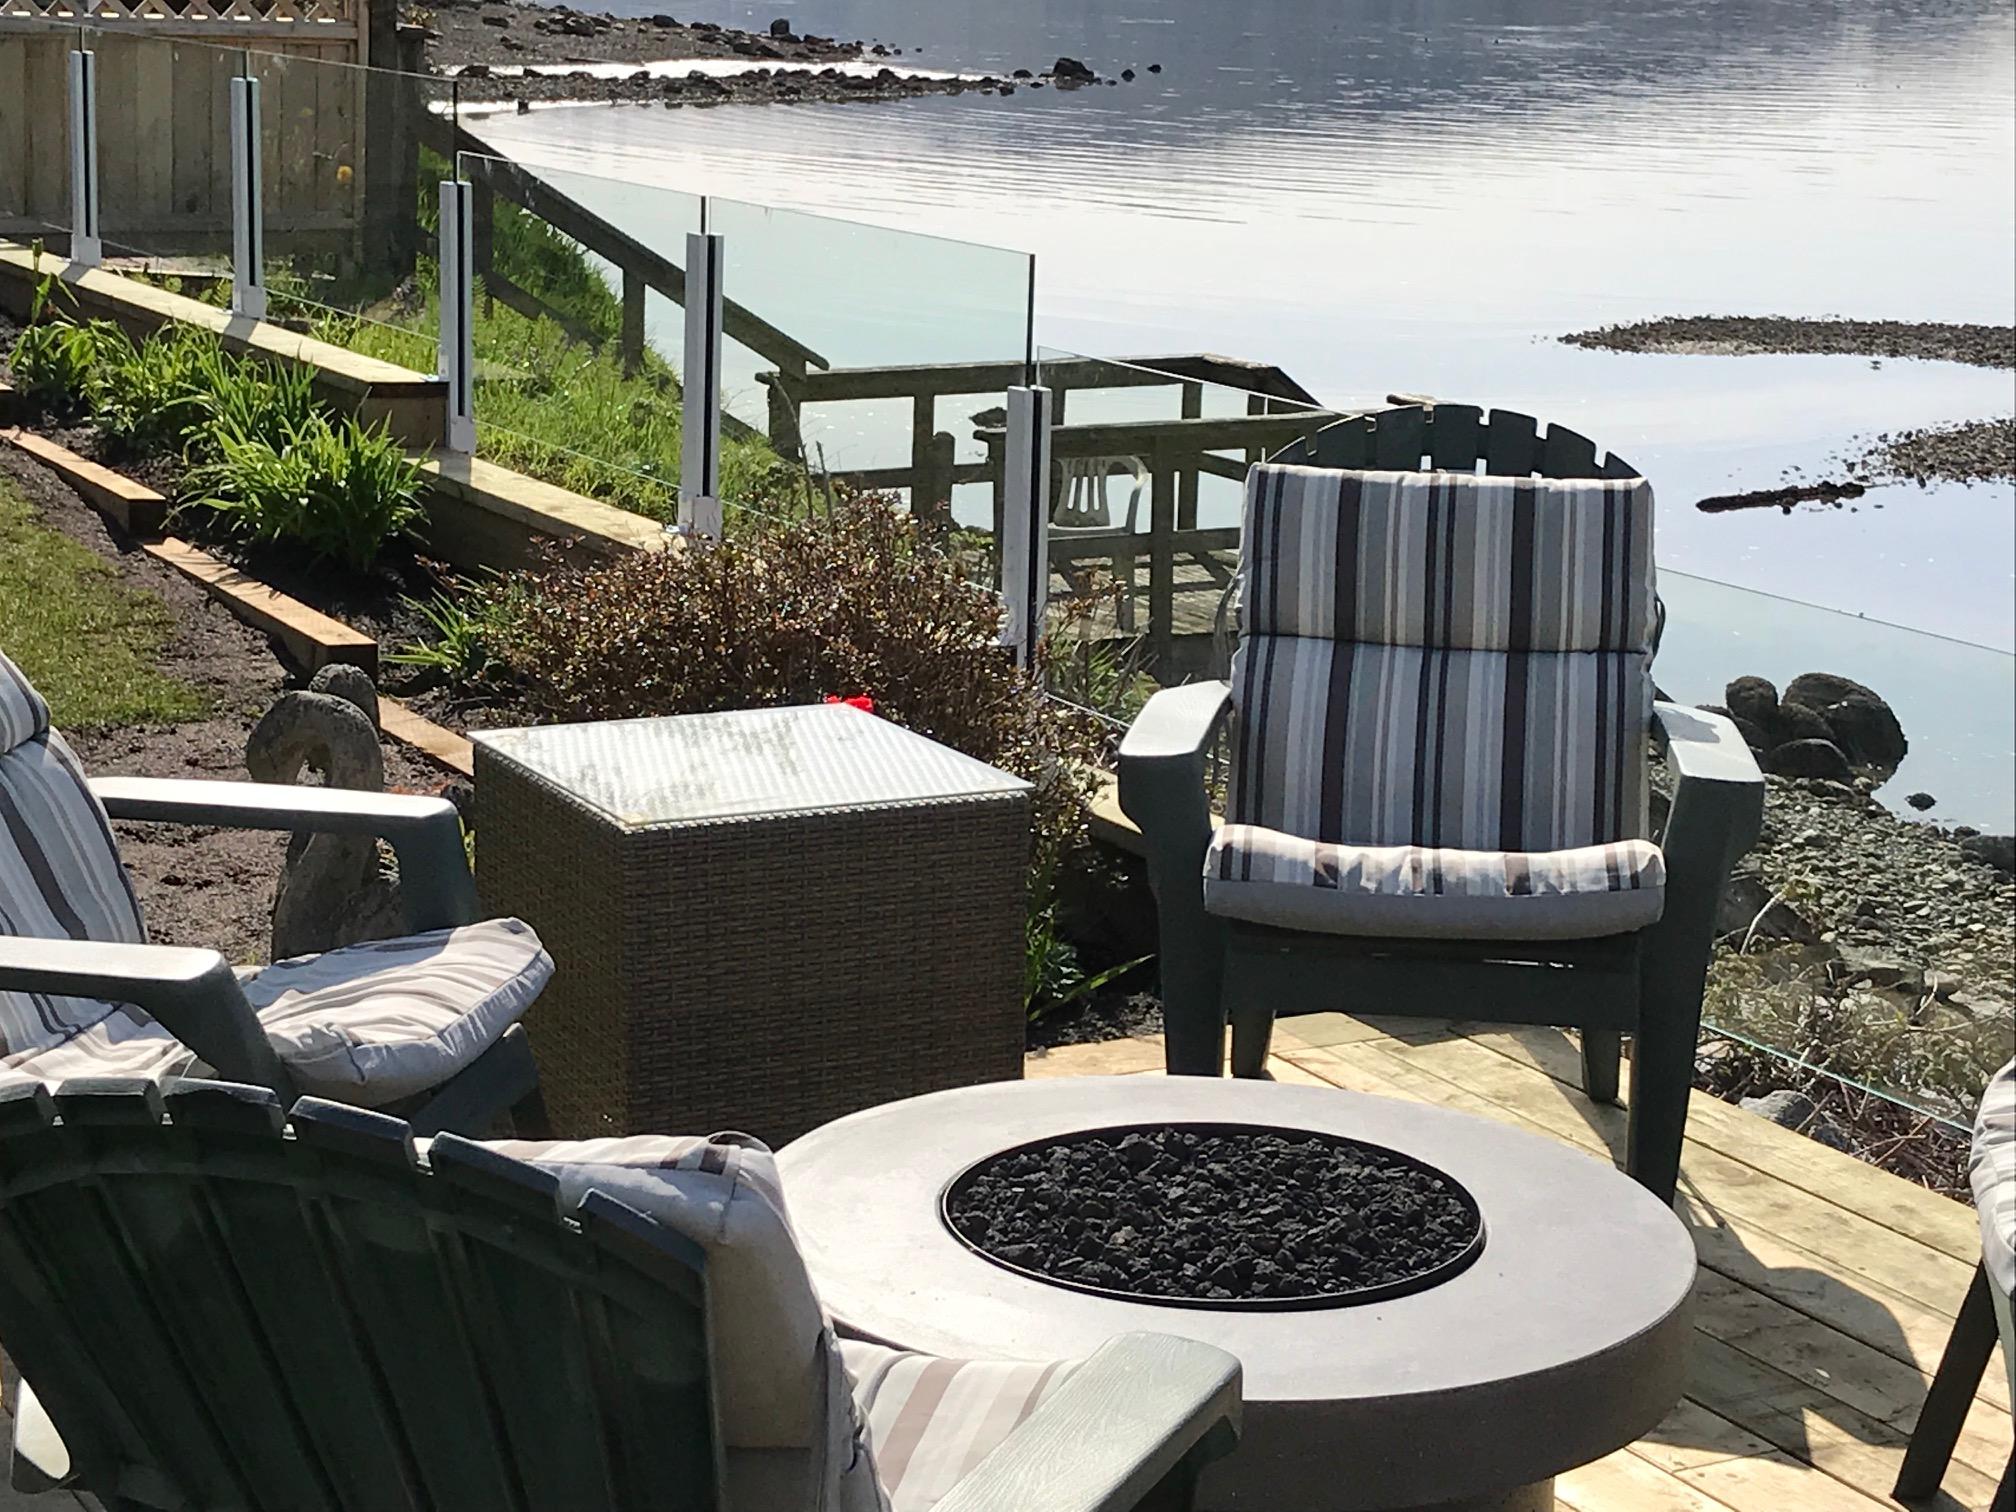 olmani-vancouver-patio-sun-deck-renovation-8.jpg